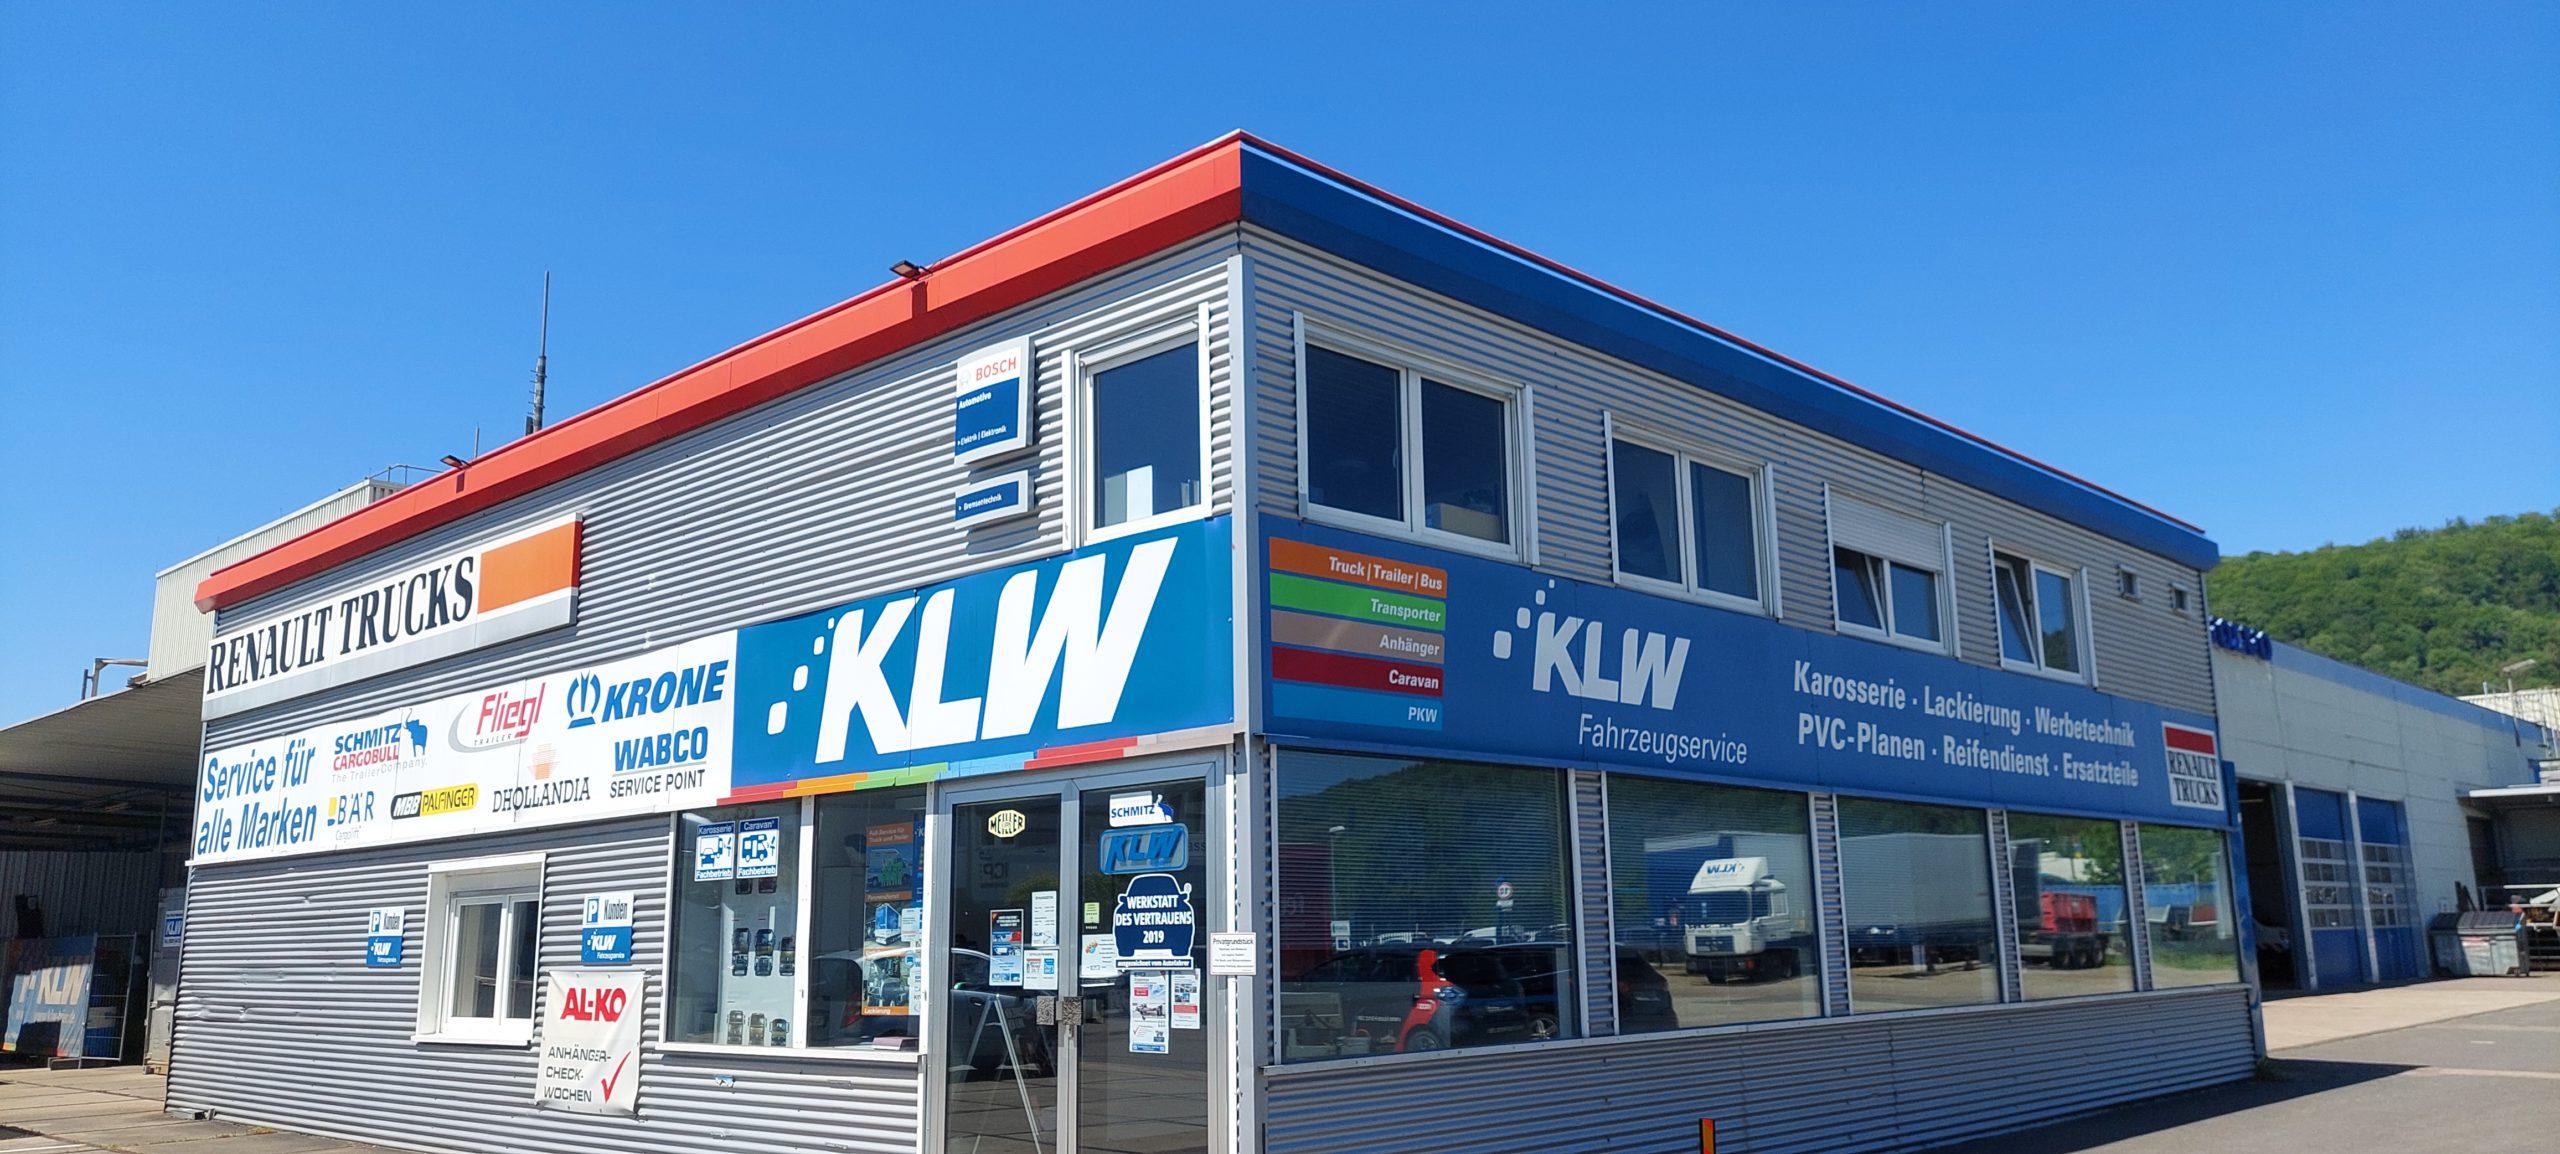 KLW Fahrzeugtechnik GmbH - Monaiser Str. 9A - 54294 Trier